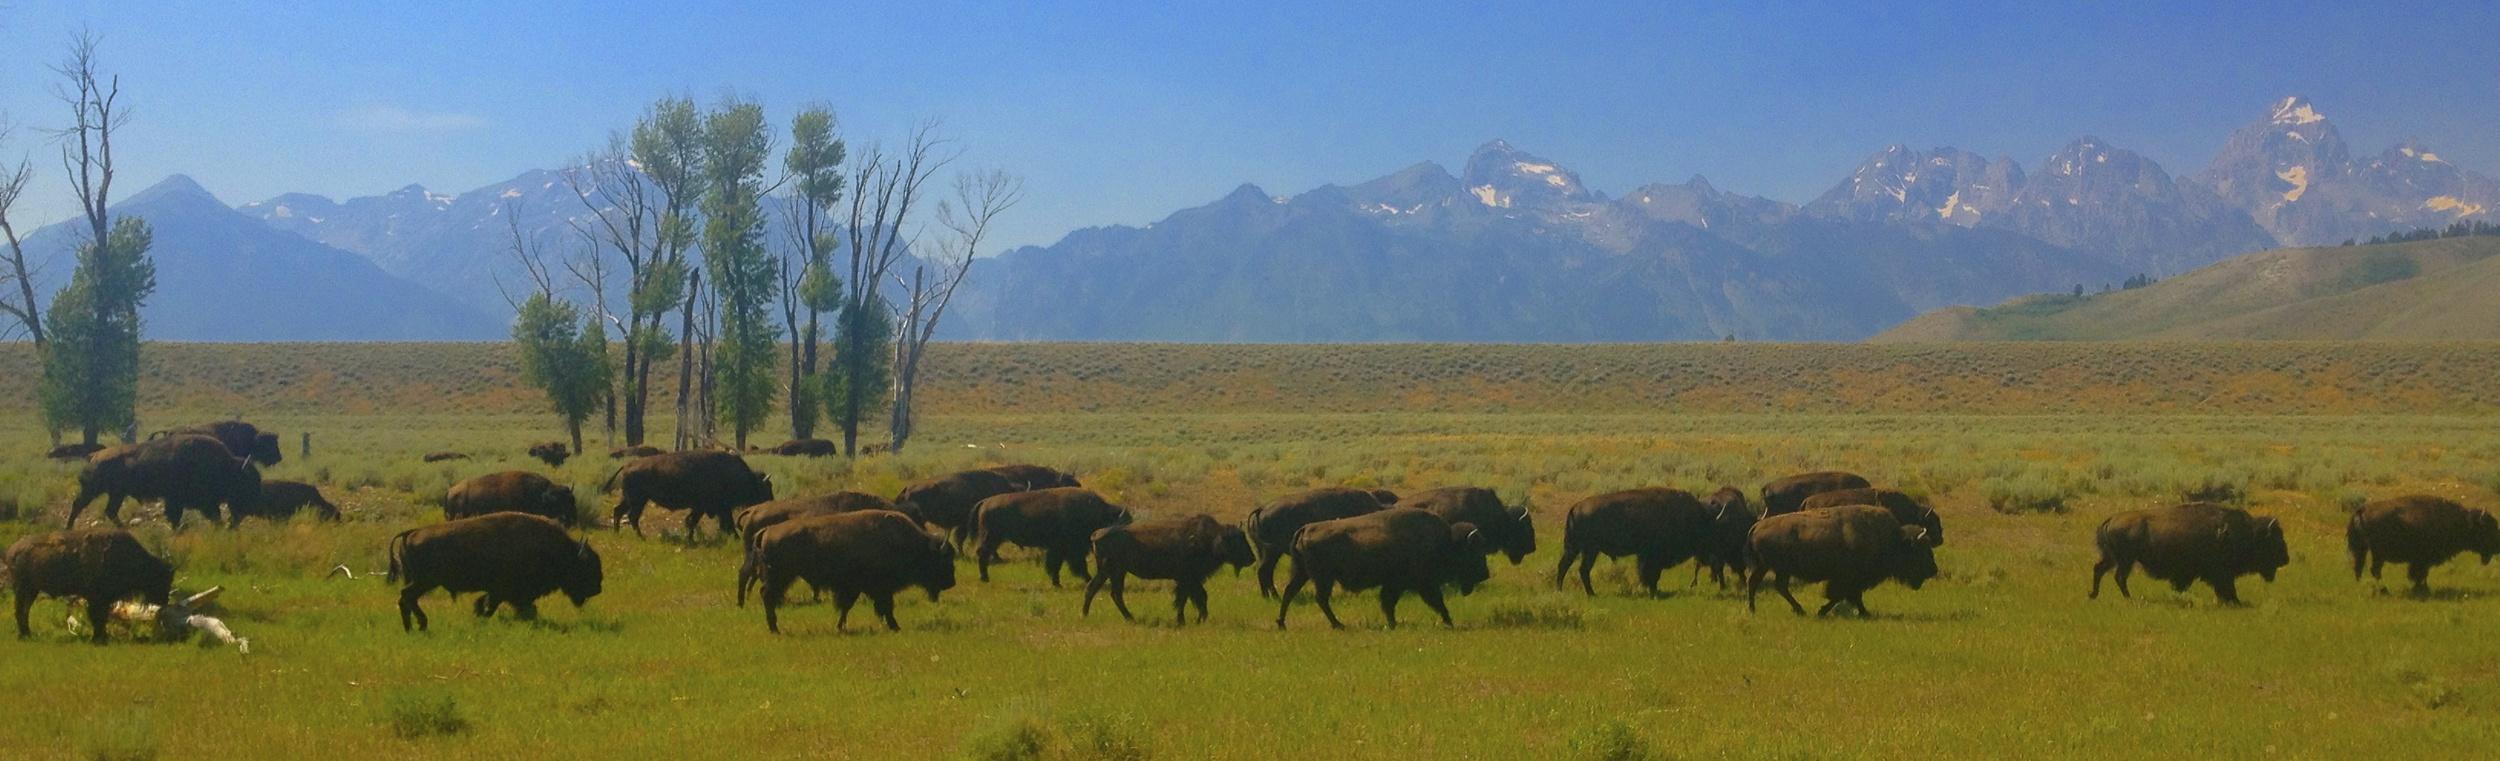 Kelly, Wyoming